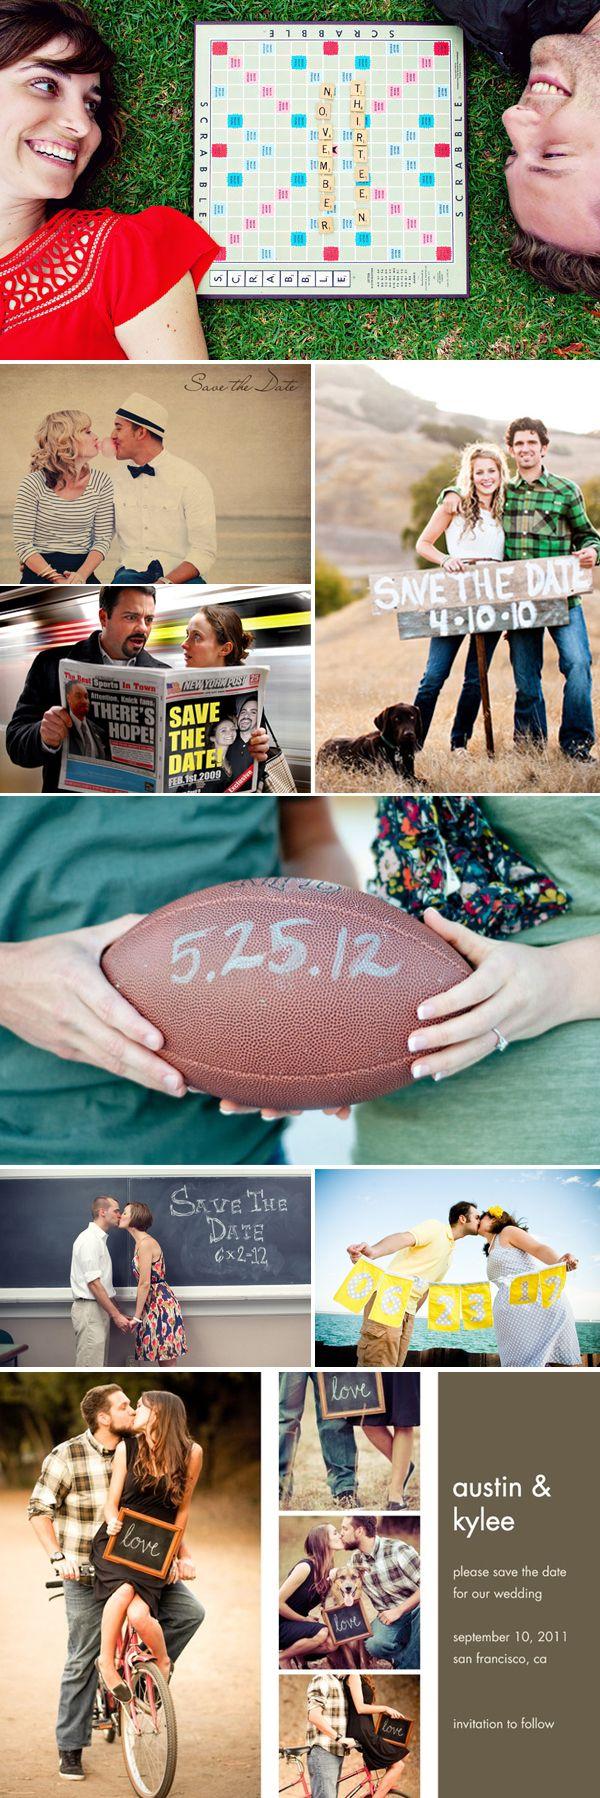 Save the date <3 the football idea....